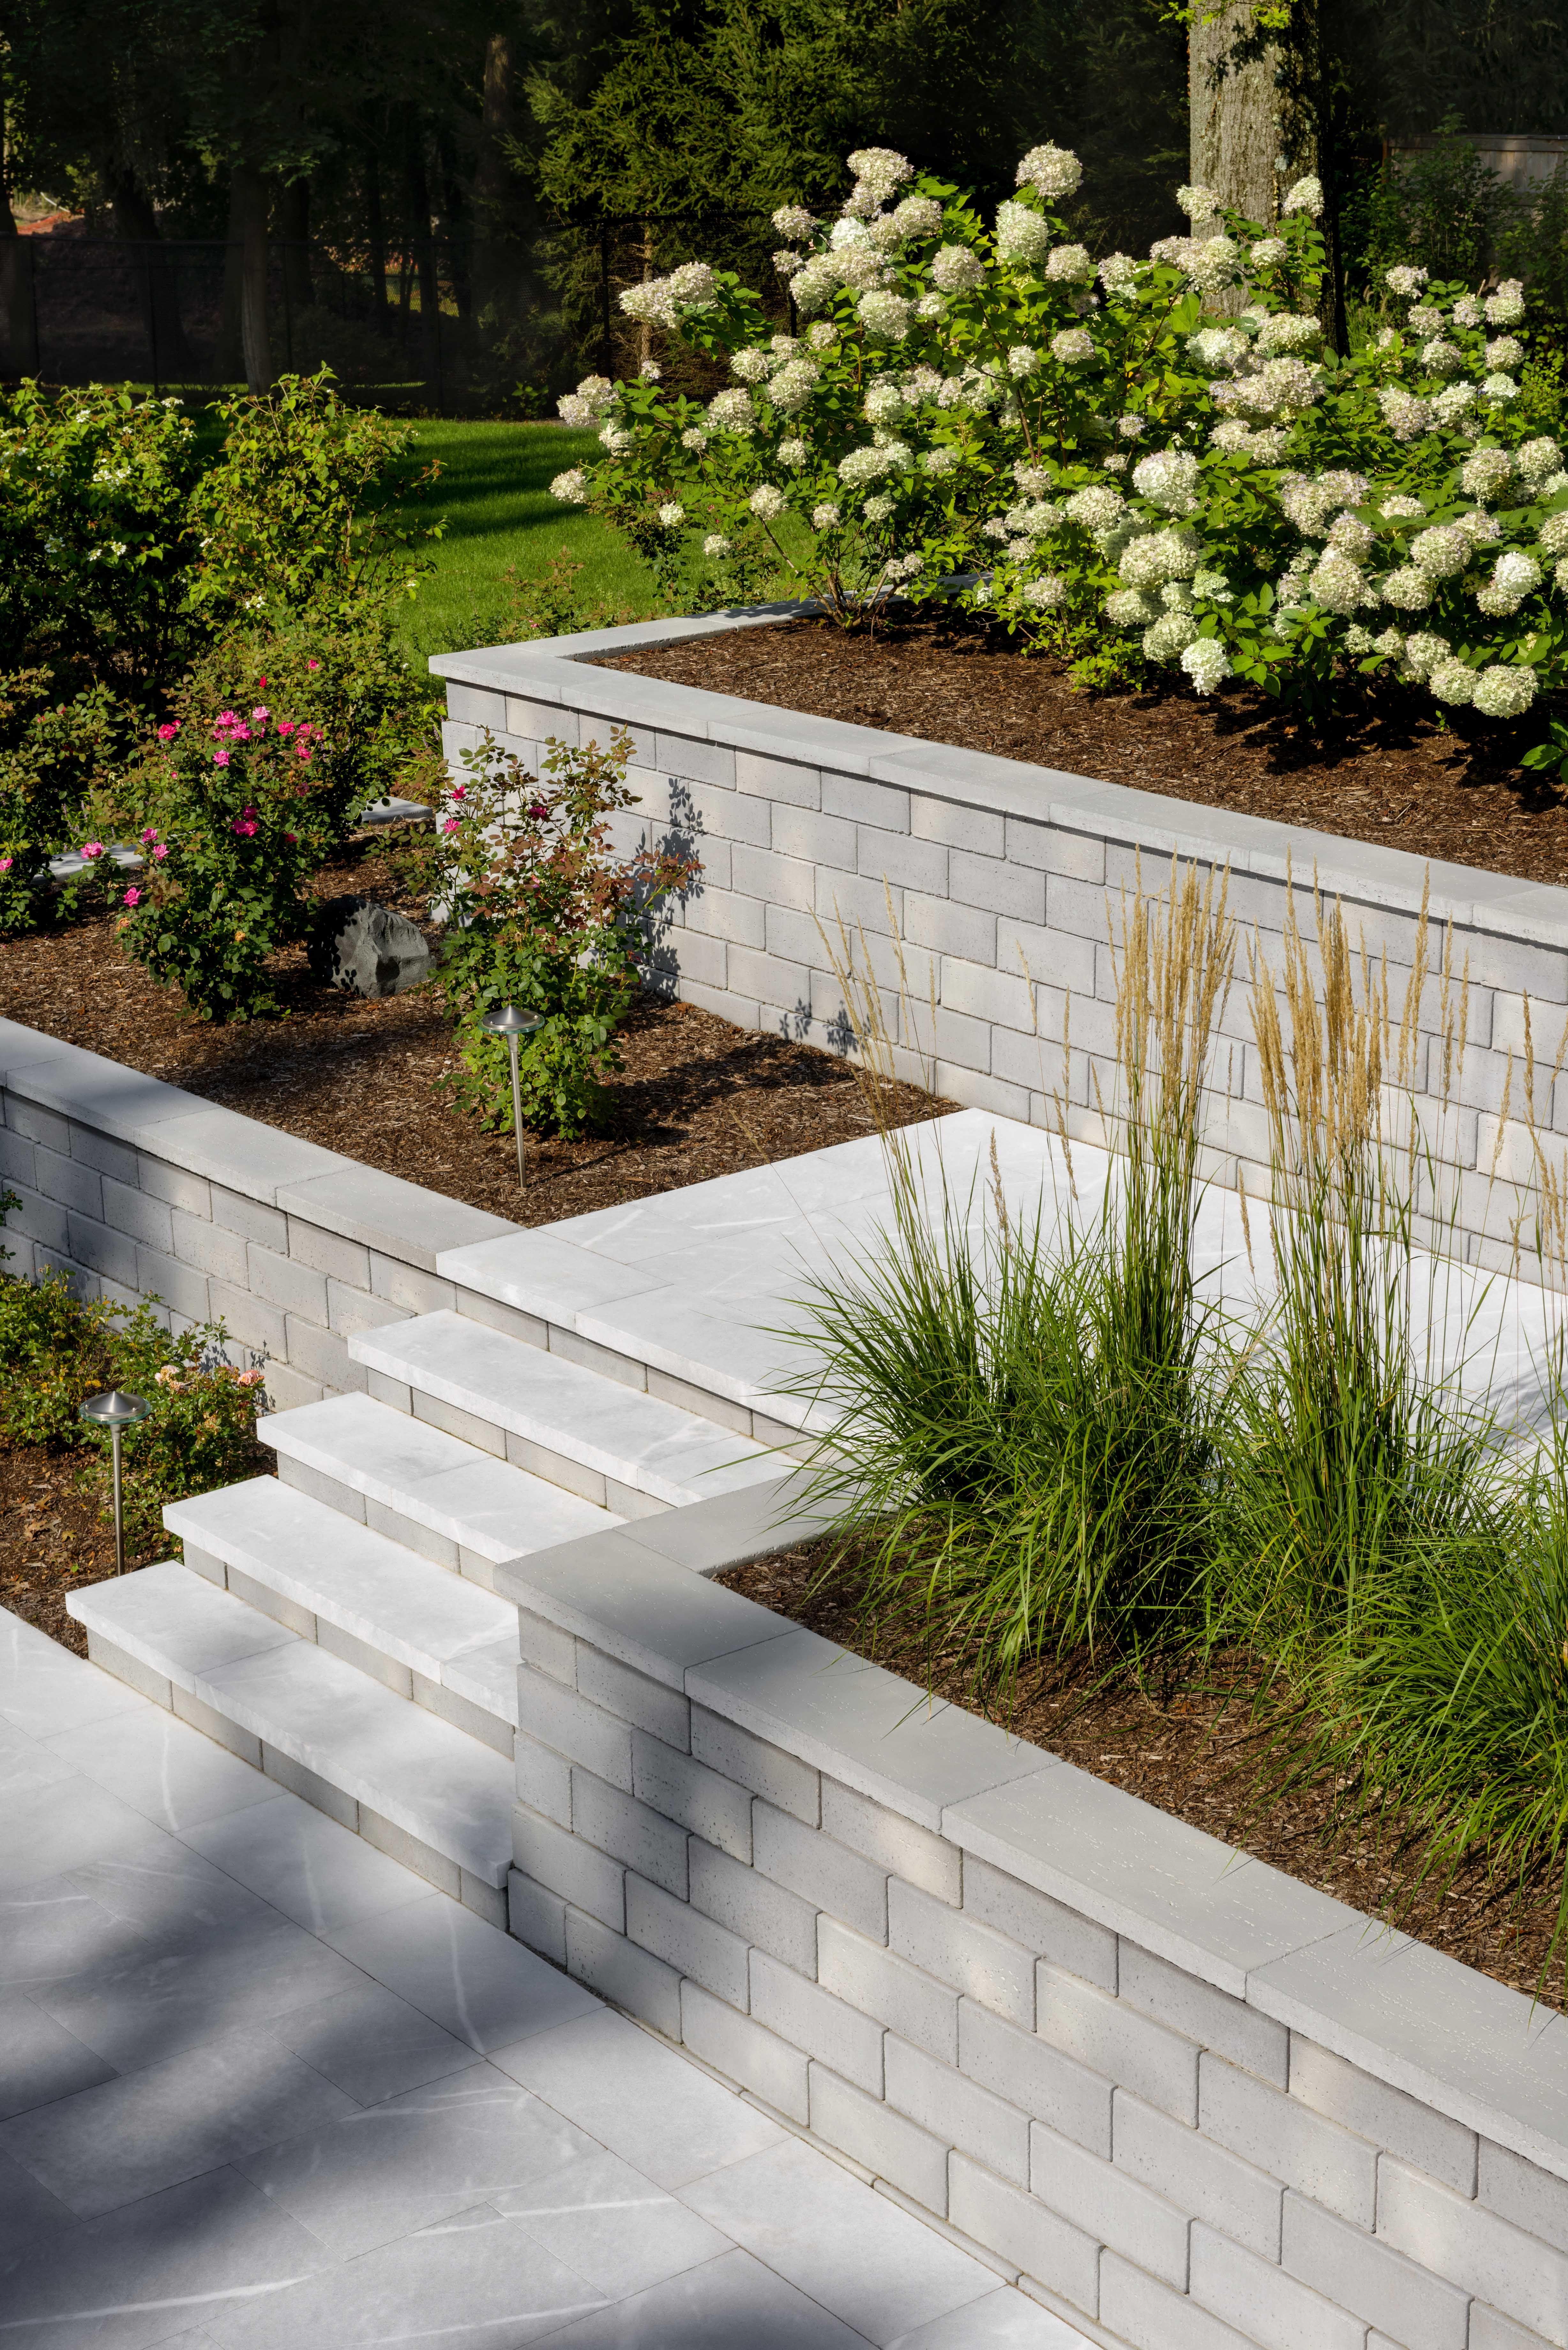 Beholde Wall Ideas Front Yard Landscaping Design Backyard Retaining Walls Landscaping Retaining Walls